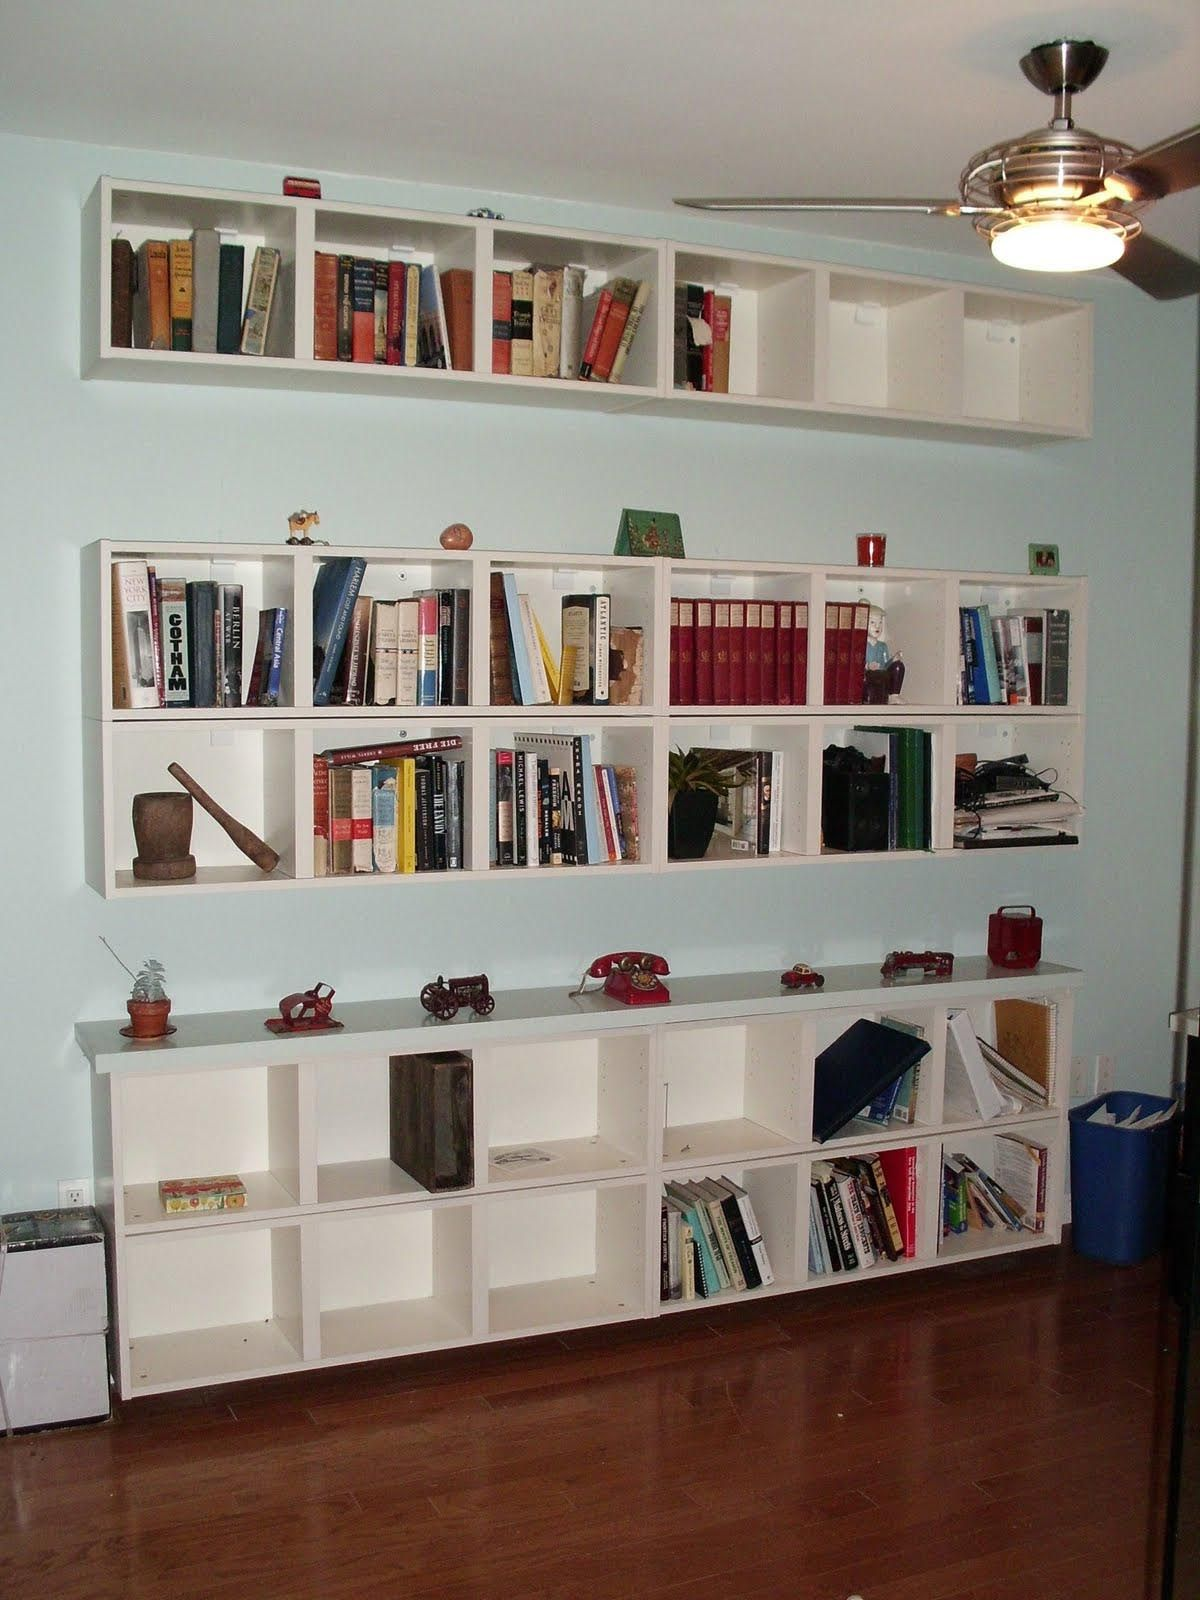 hanging wall shelves for books - Bookshelves Hanging Wall